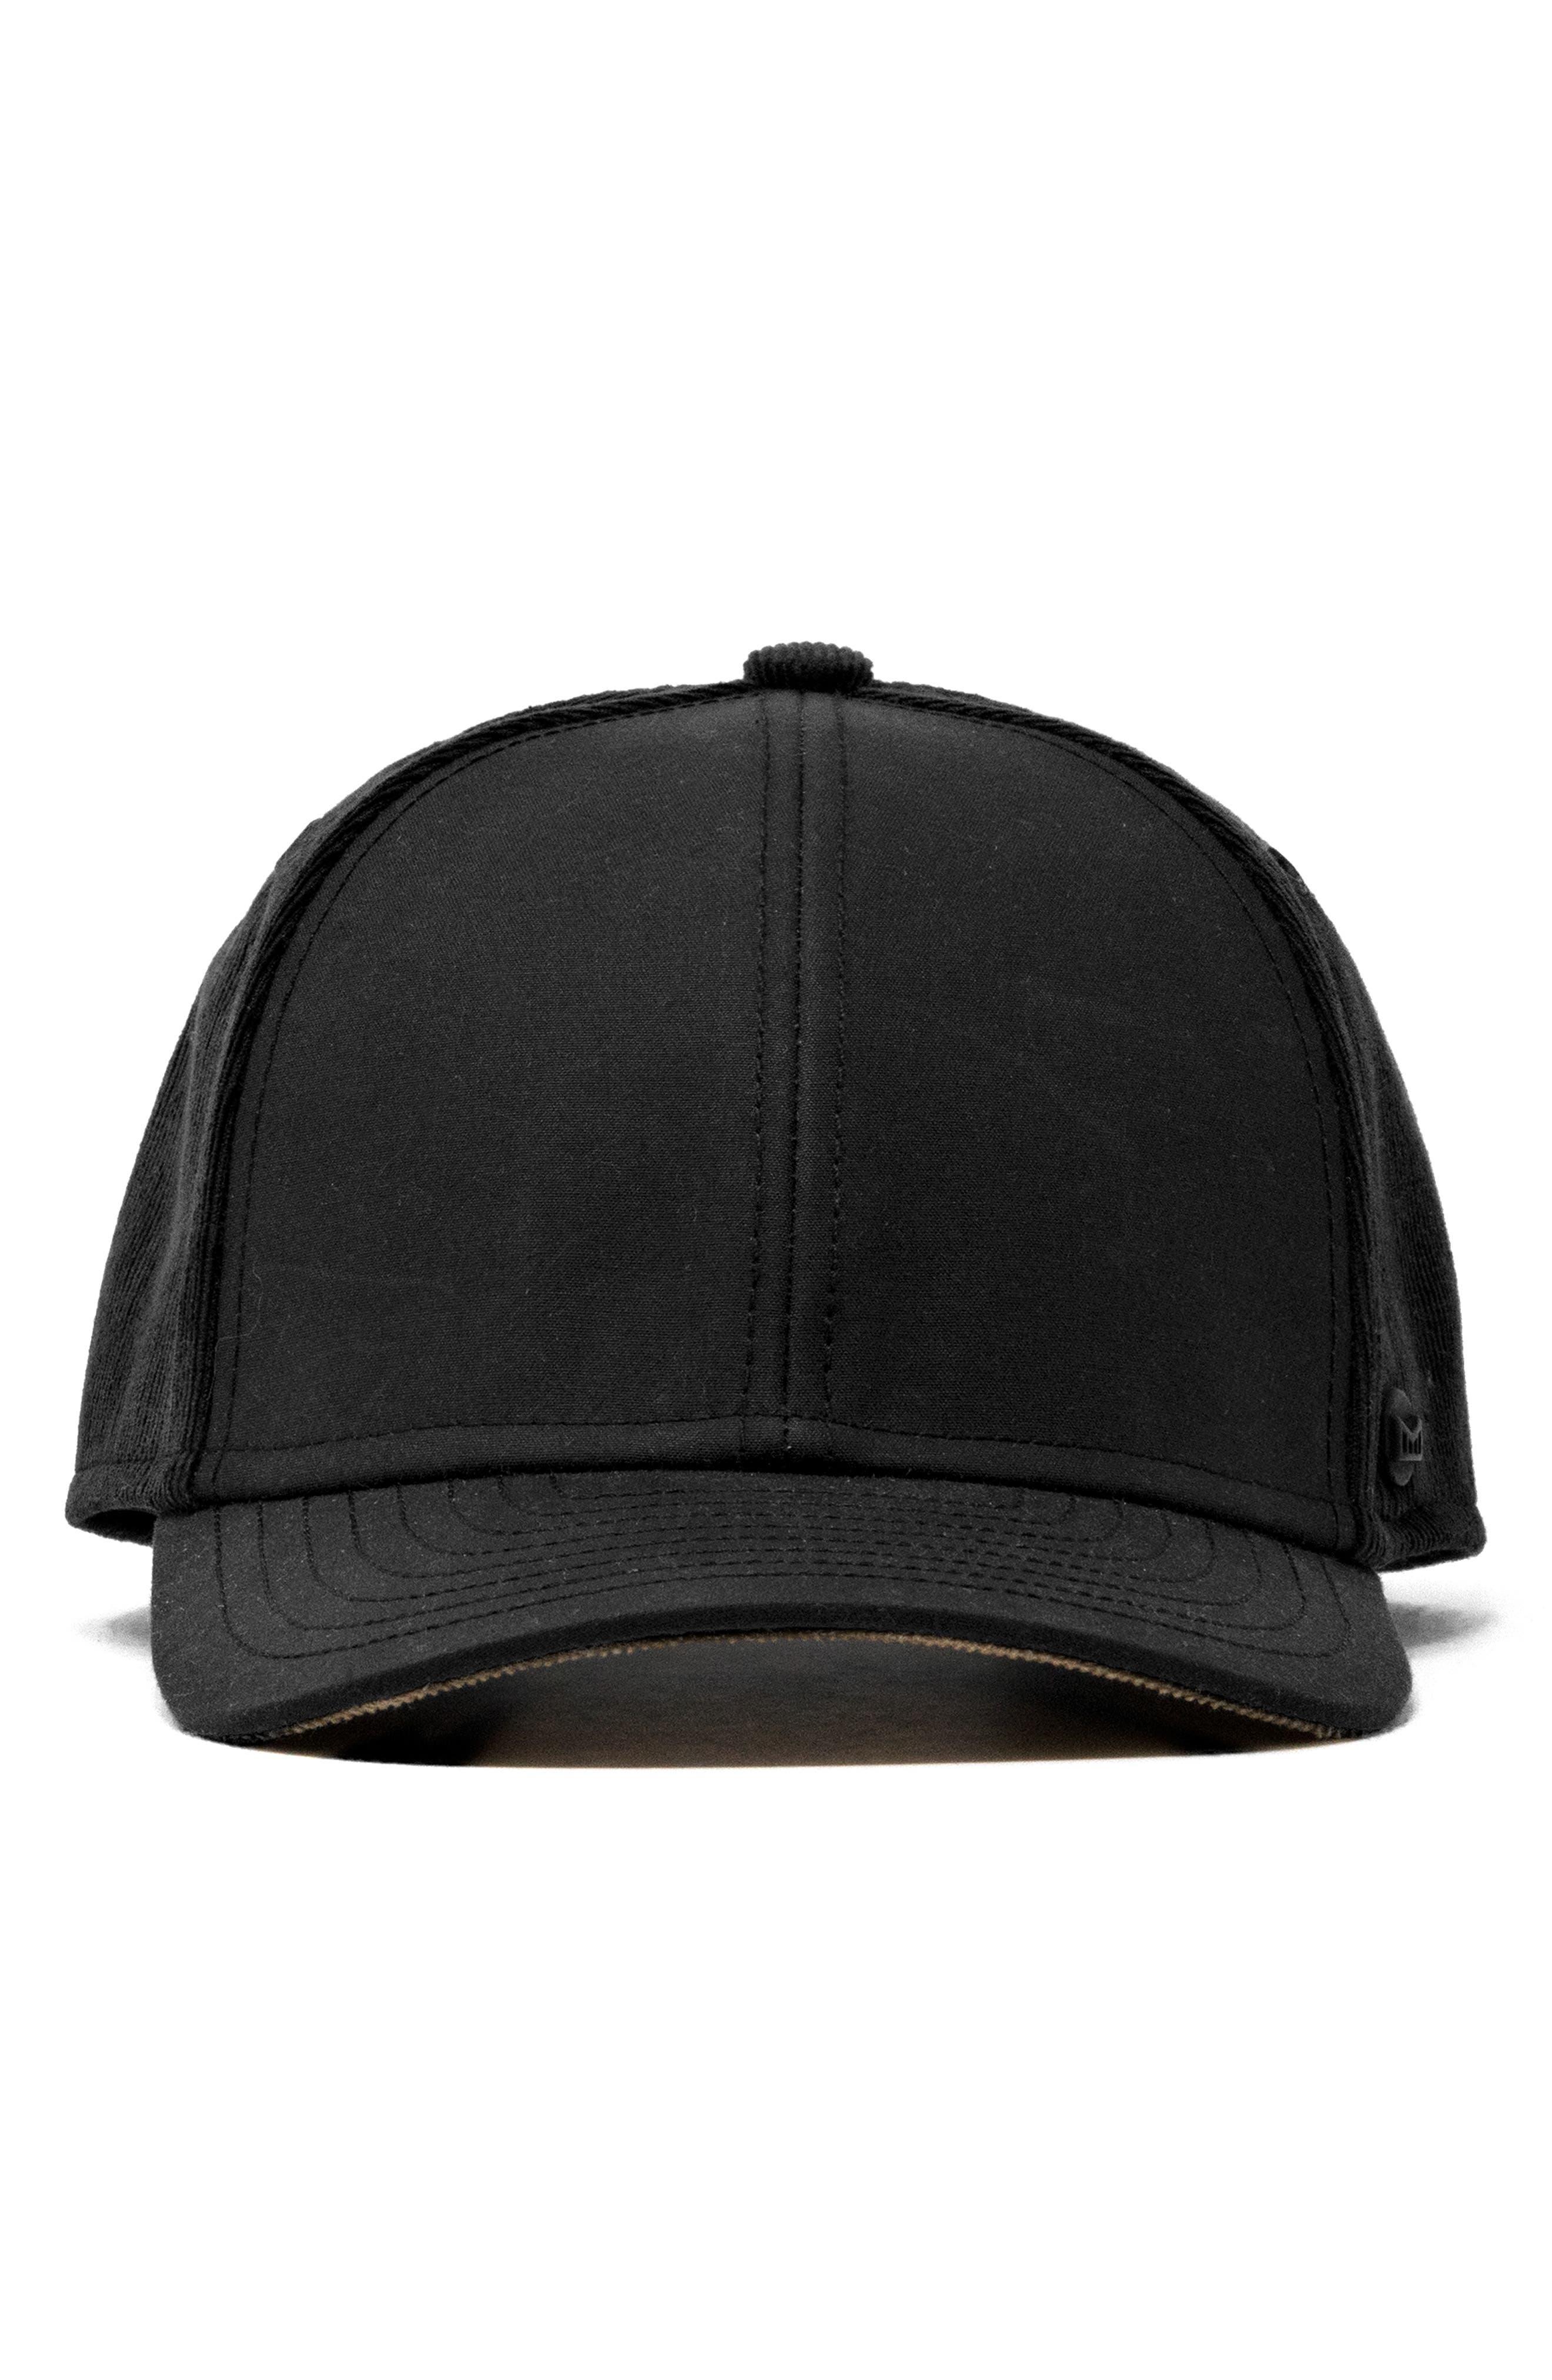 Discovery Baseball Cap,                             Alternate thumbnail 2, color,                             BLACK